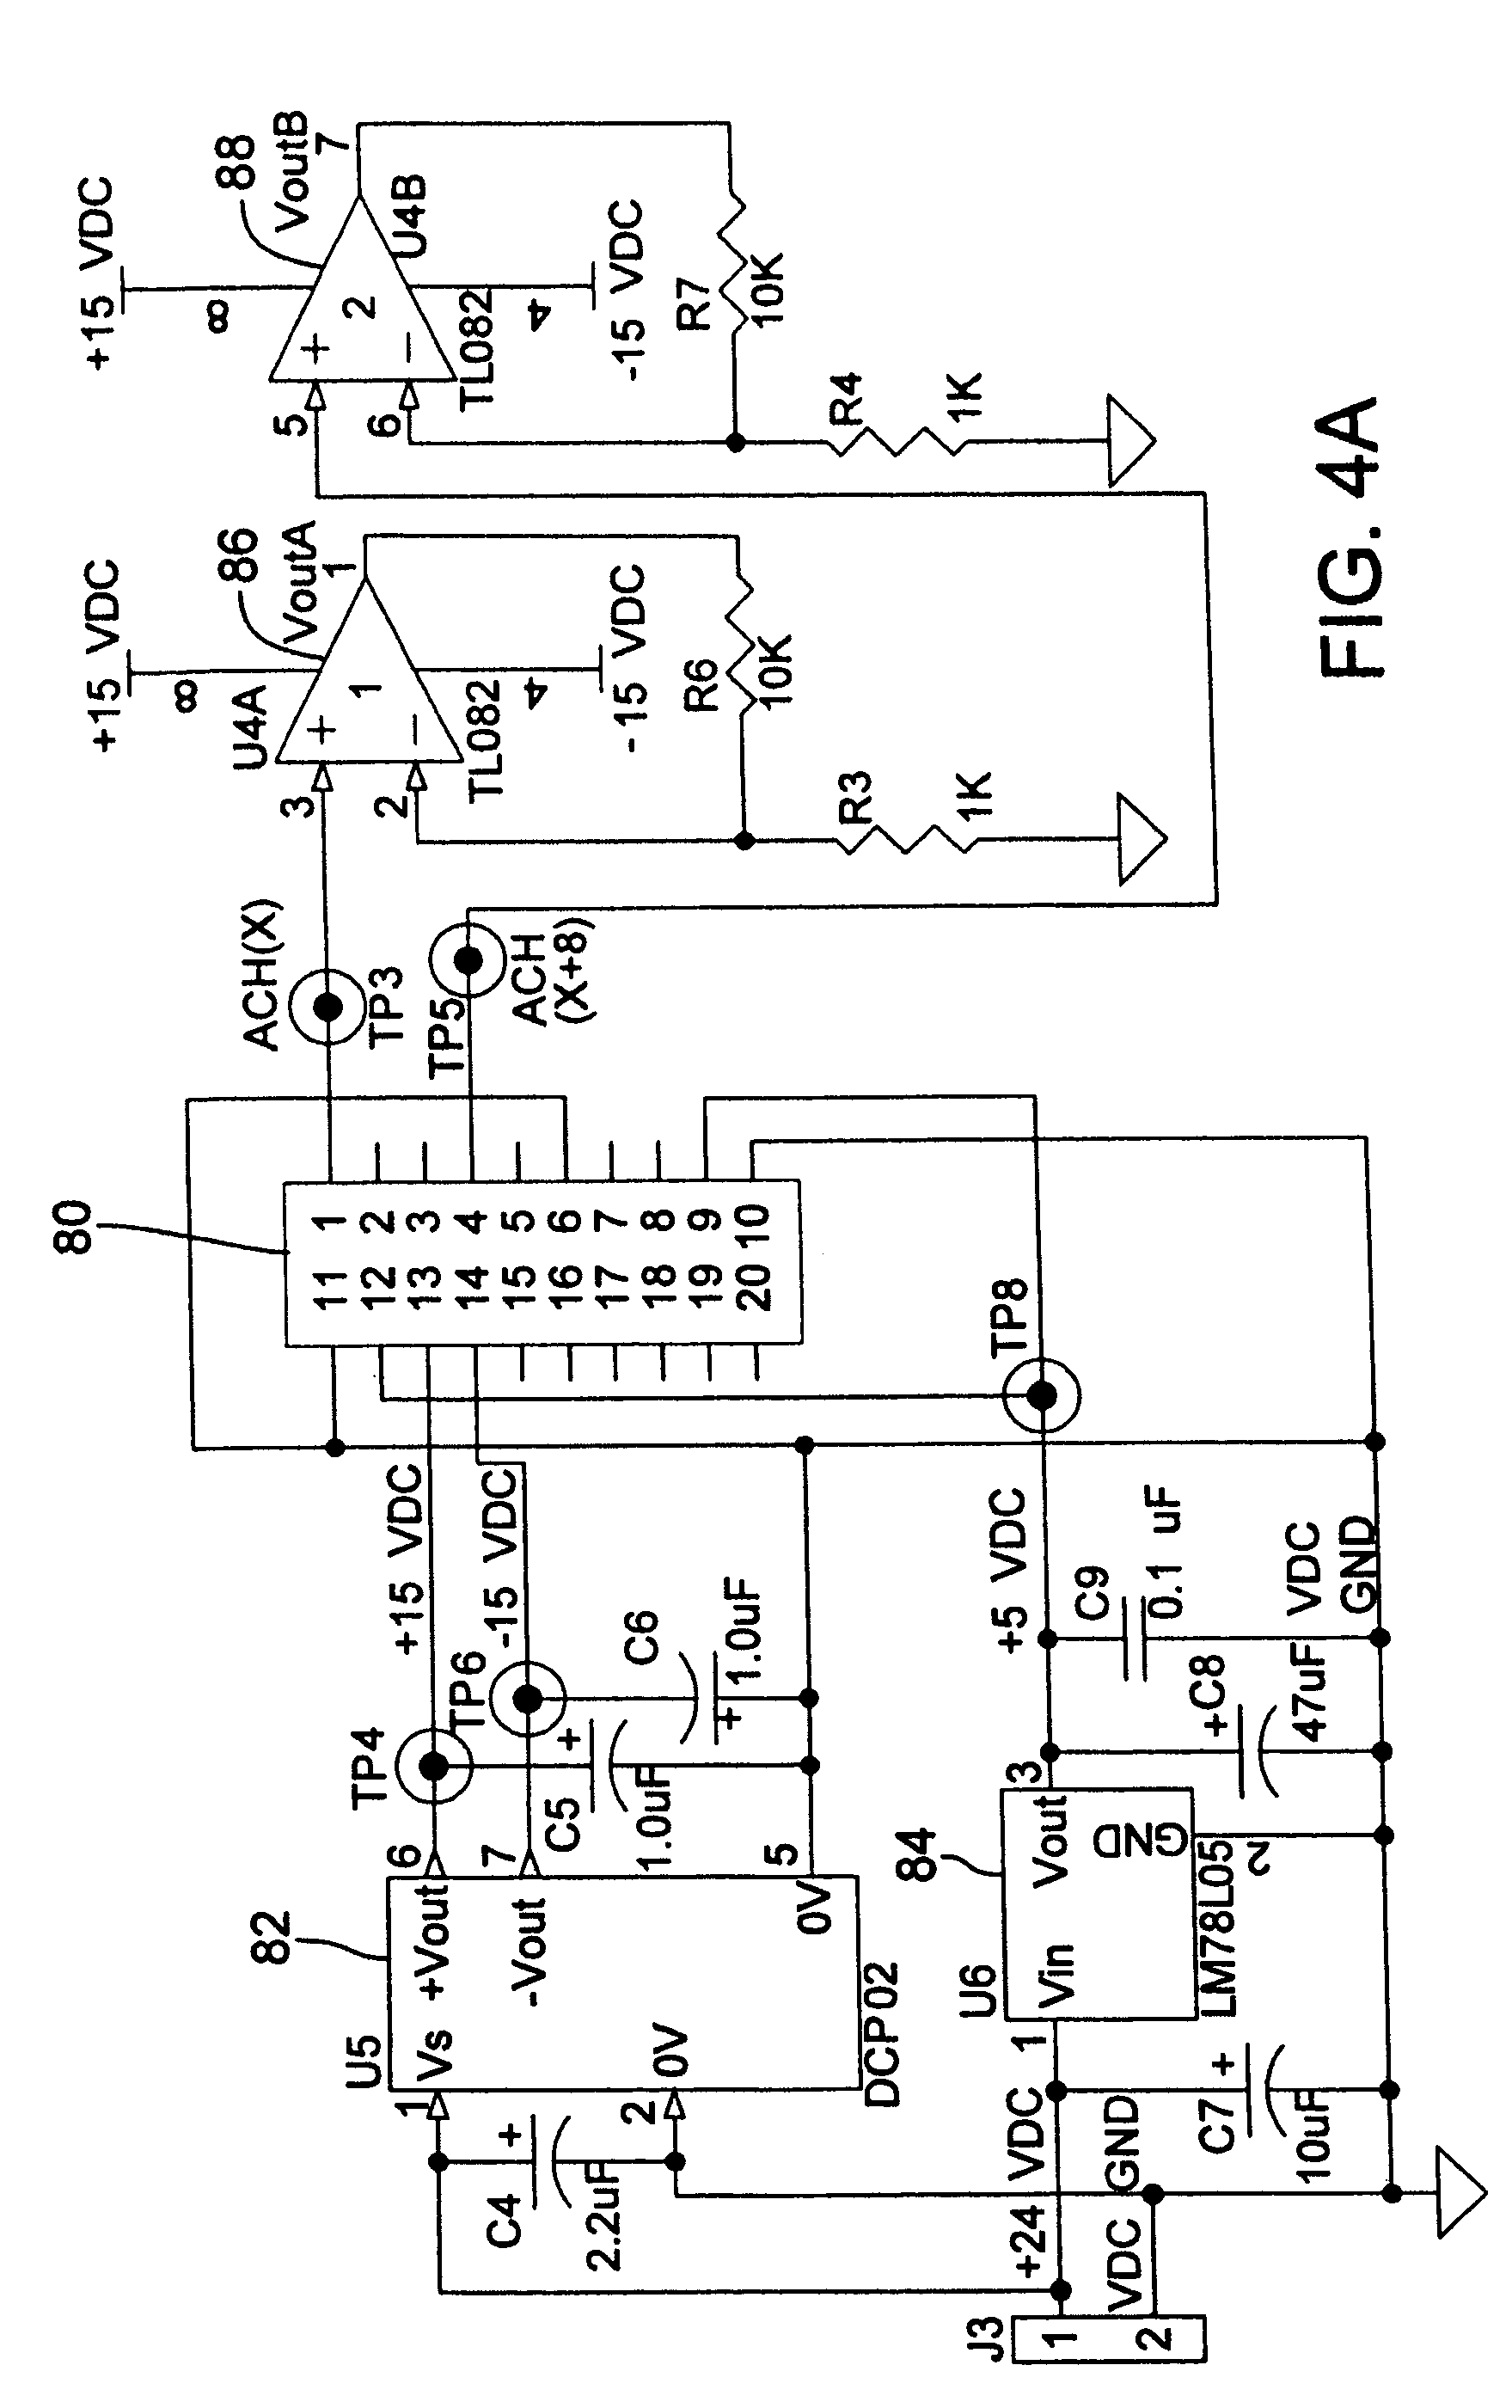 Paper Shredder Wiring Diagram Paper Organizer Wiring